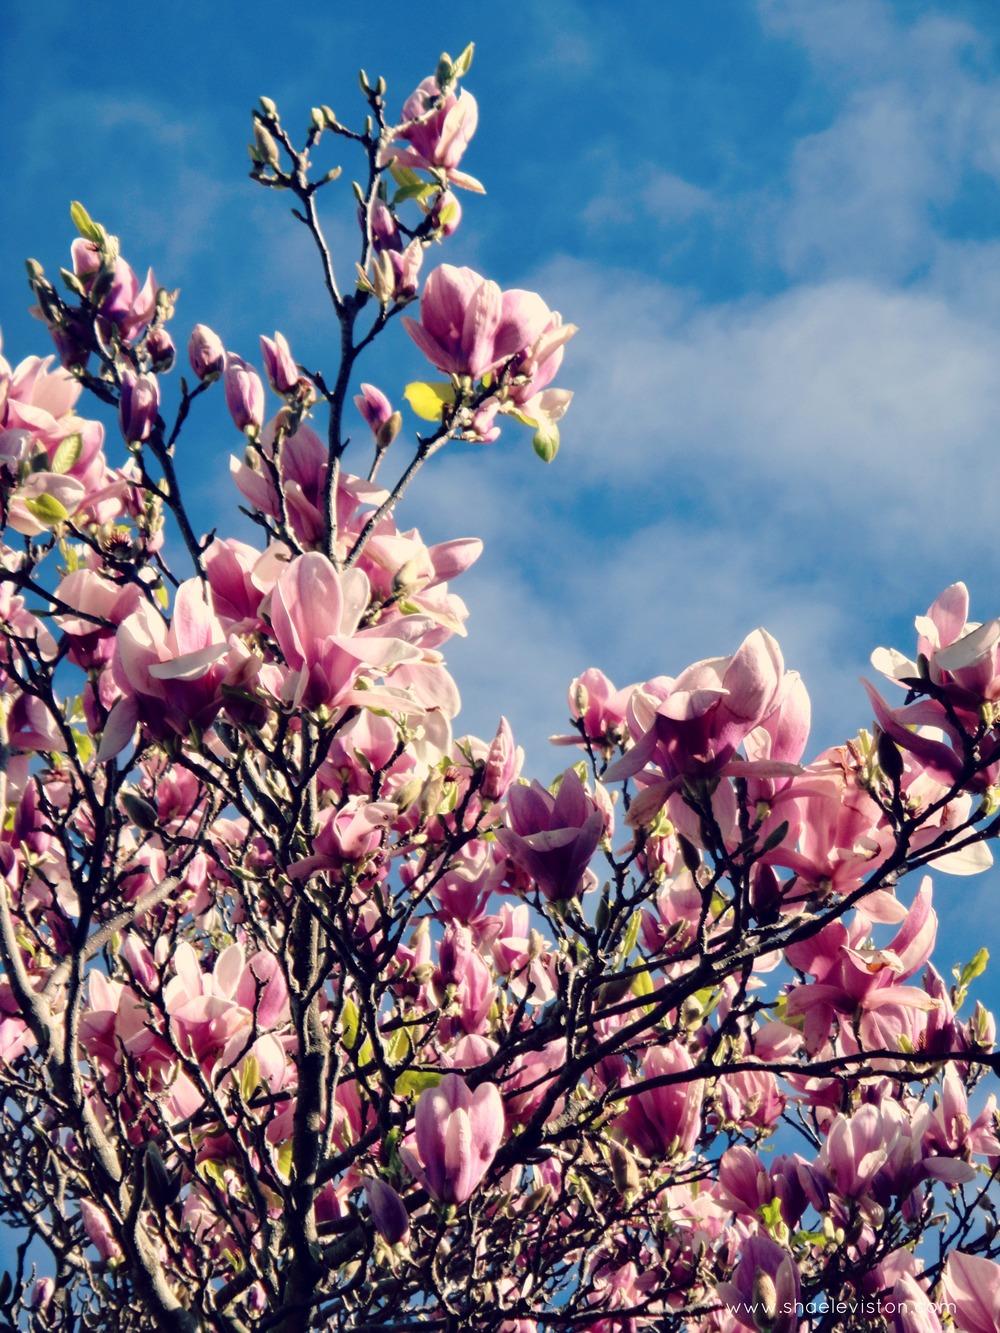 magnolia shae leviston2013.jpg